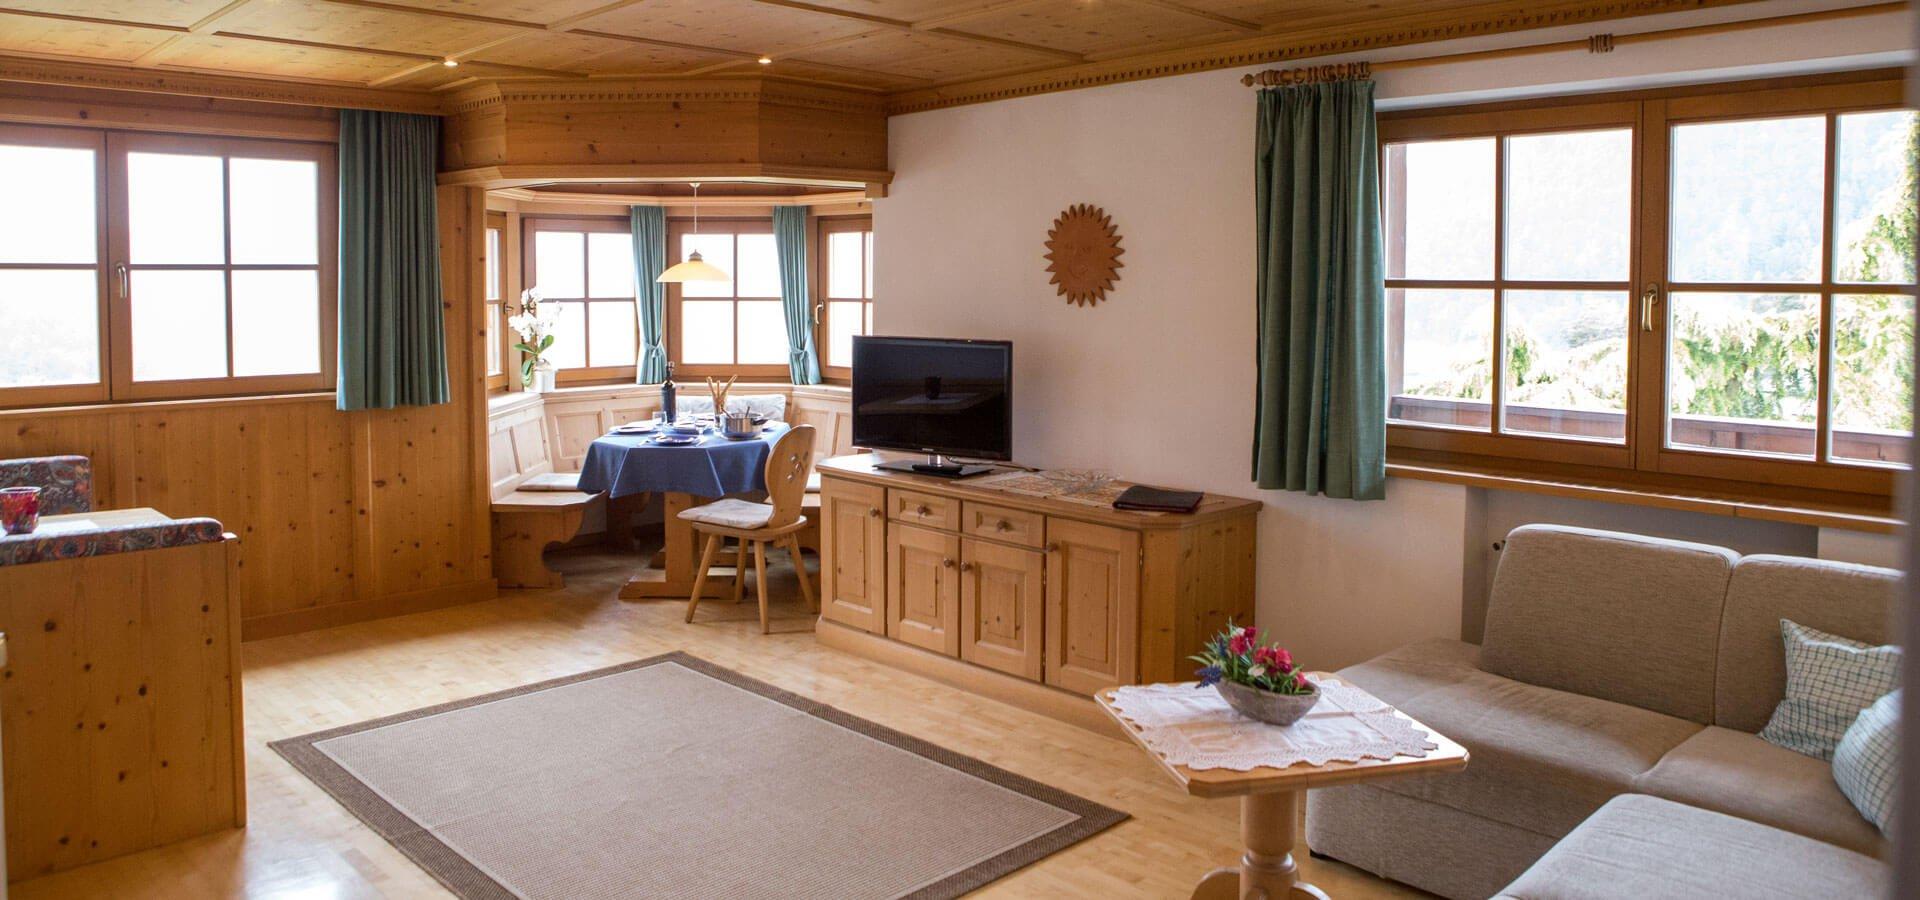 residence-burghof-ferienhaus